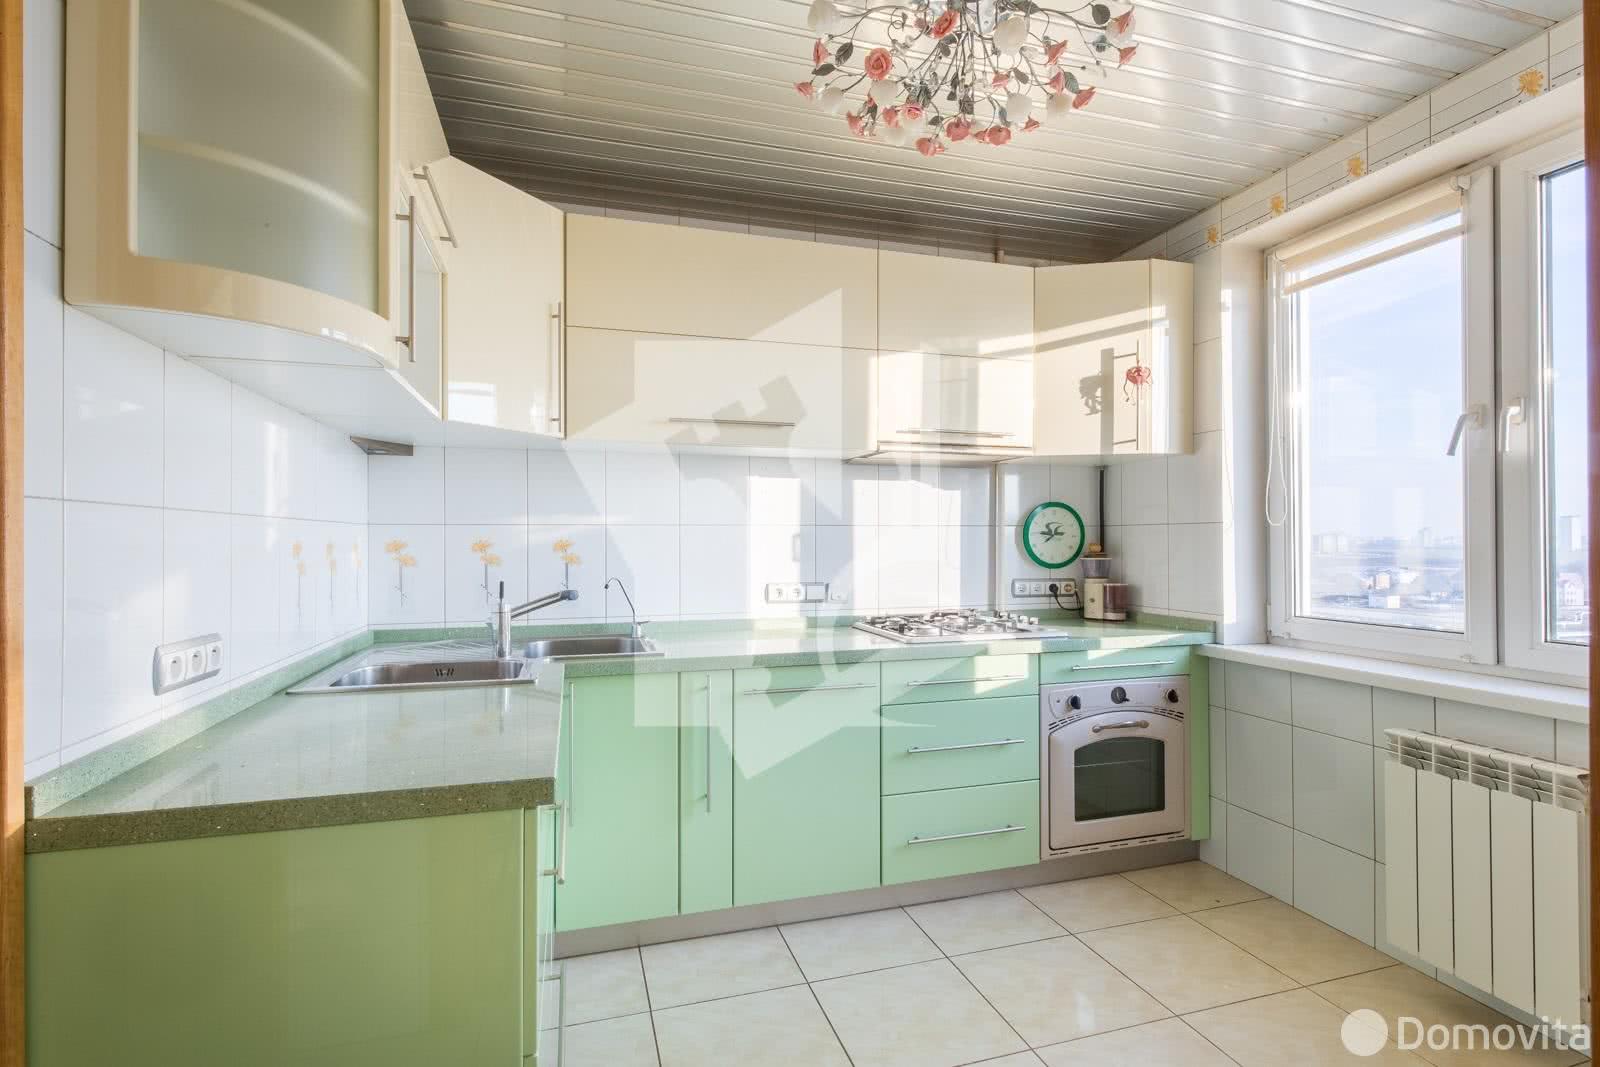 Купить 4-комнатную квартиру в Минске, ул. Пимена Панченко, д. 24 - фото 2